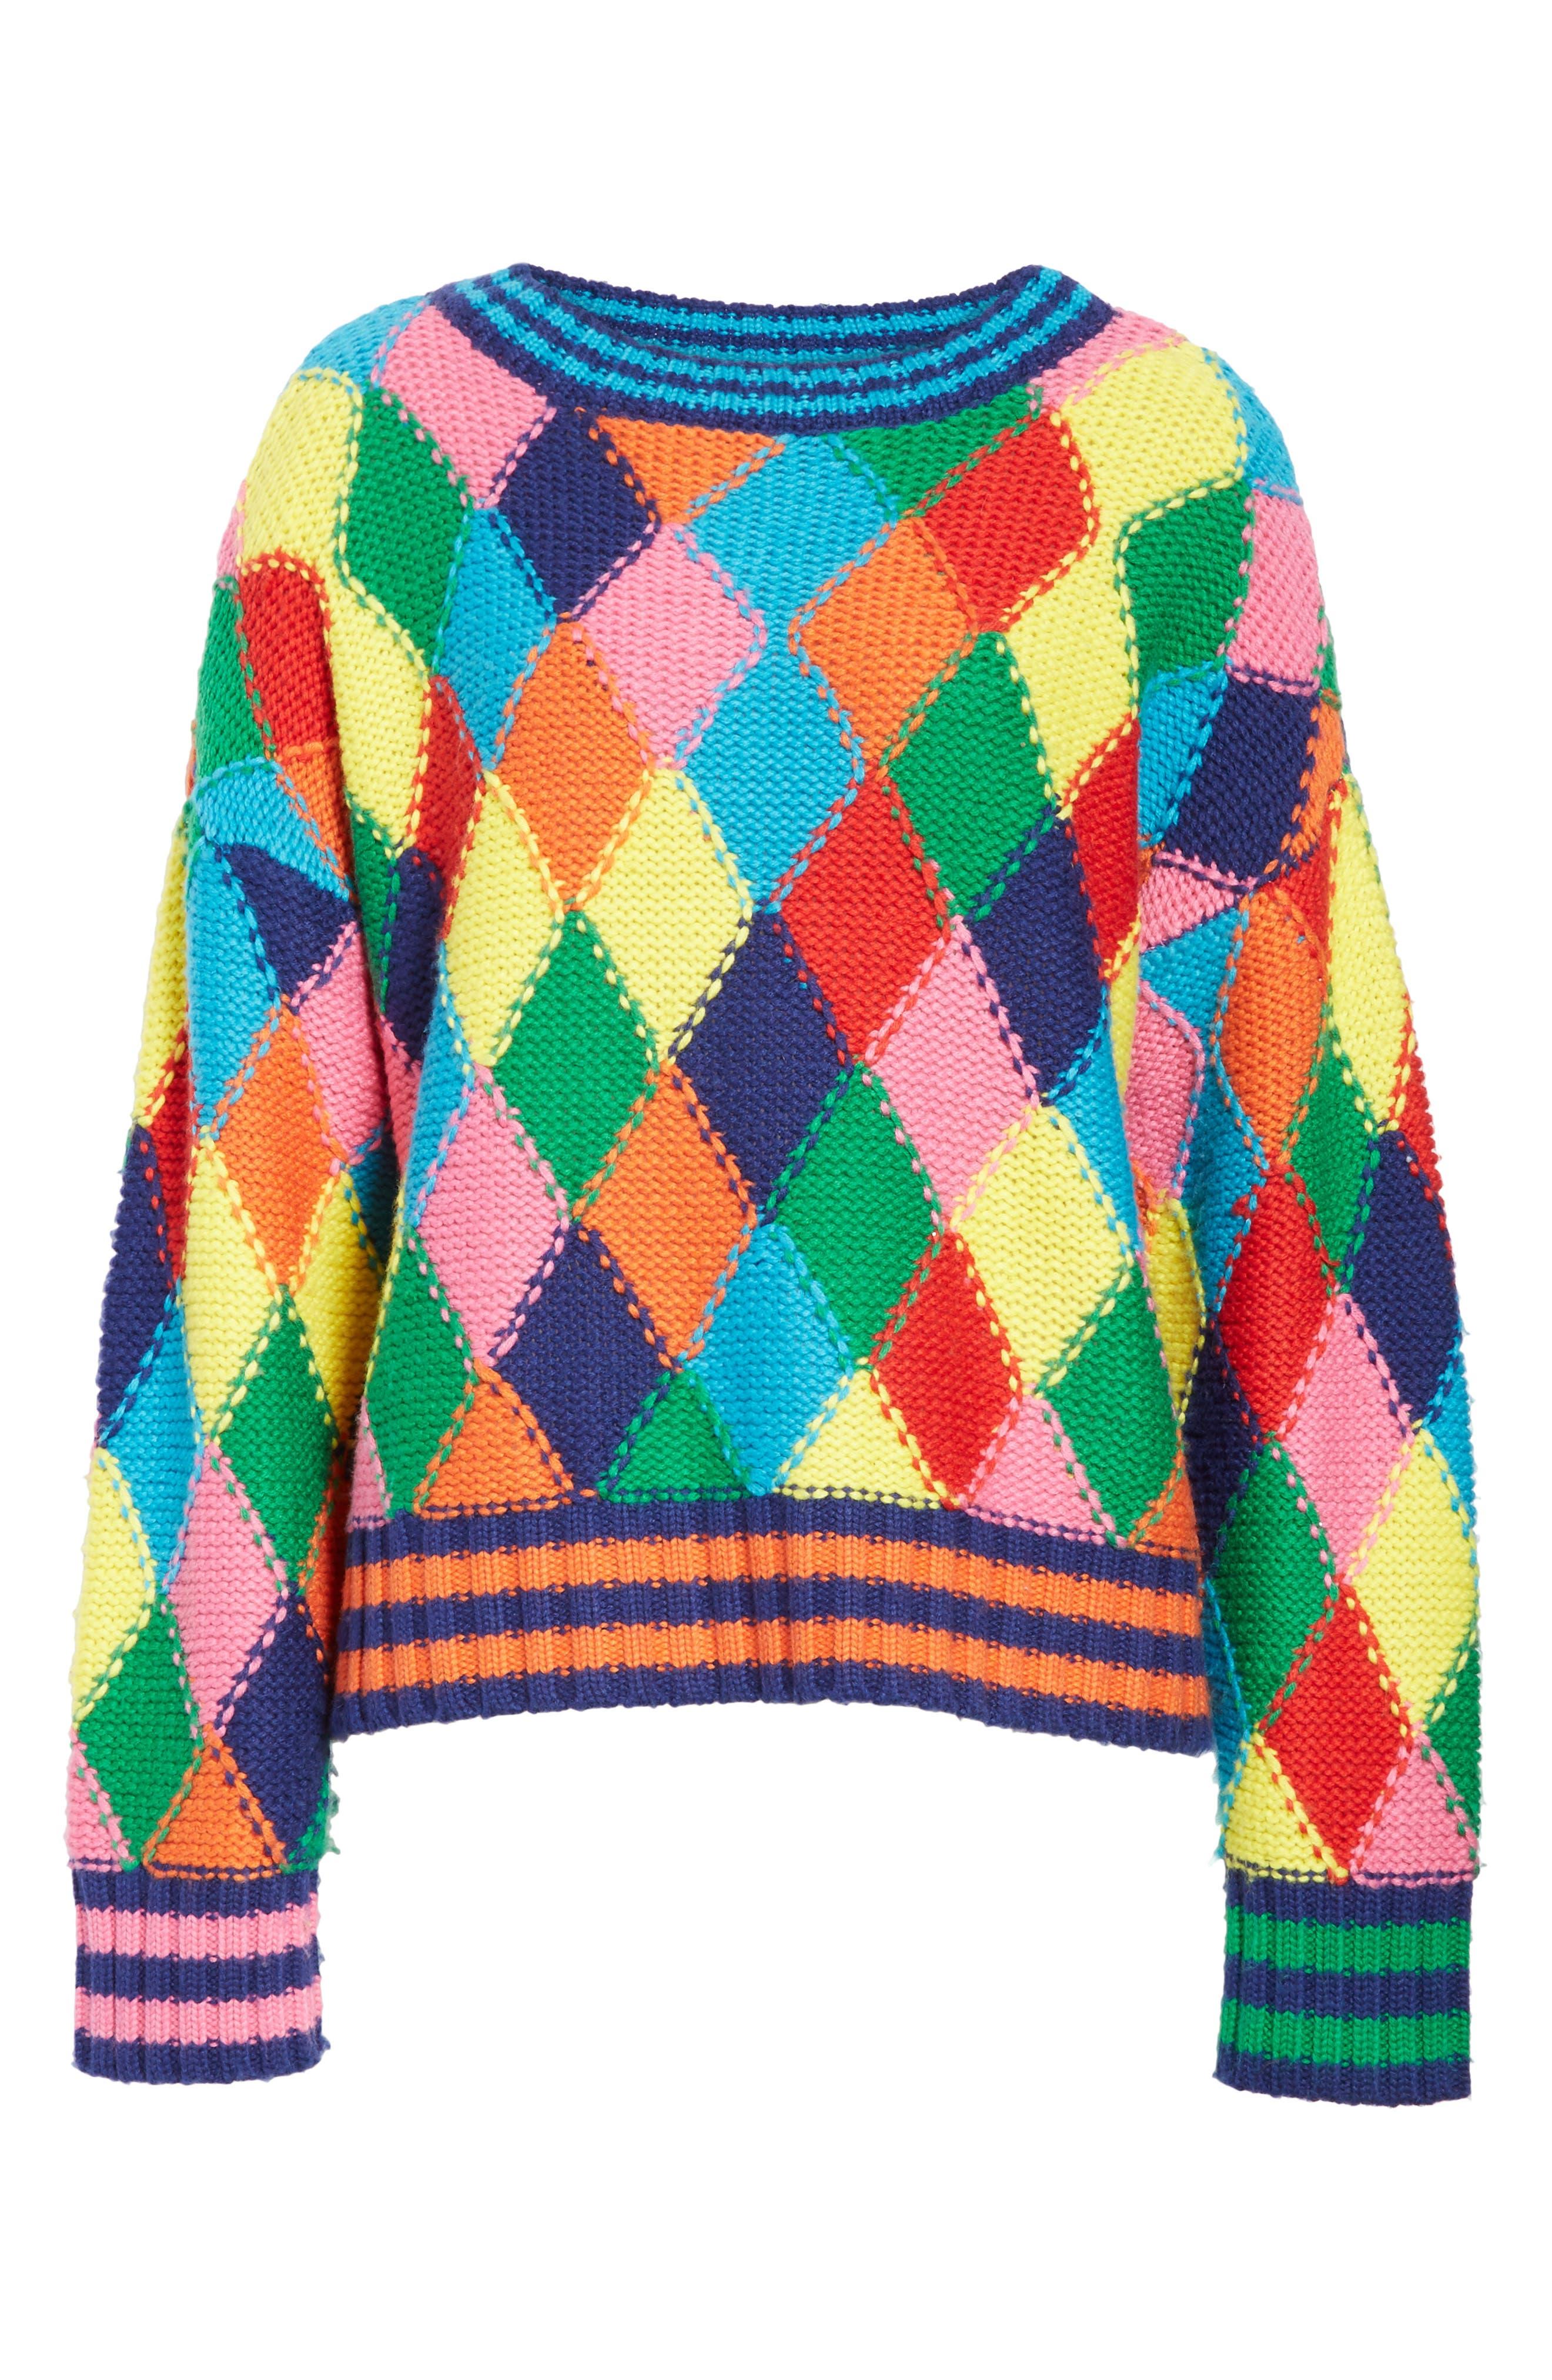 Diamond Stitch Sweater,                             Alternate thumbnail 6, color,                             960